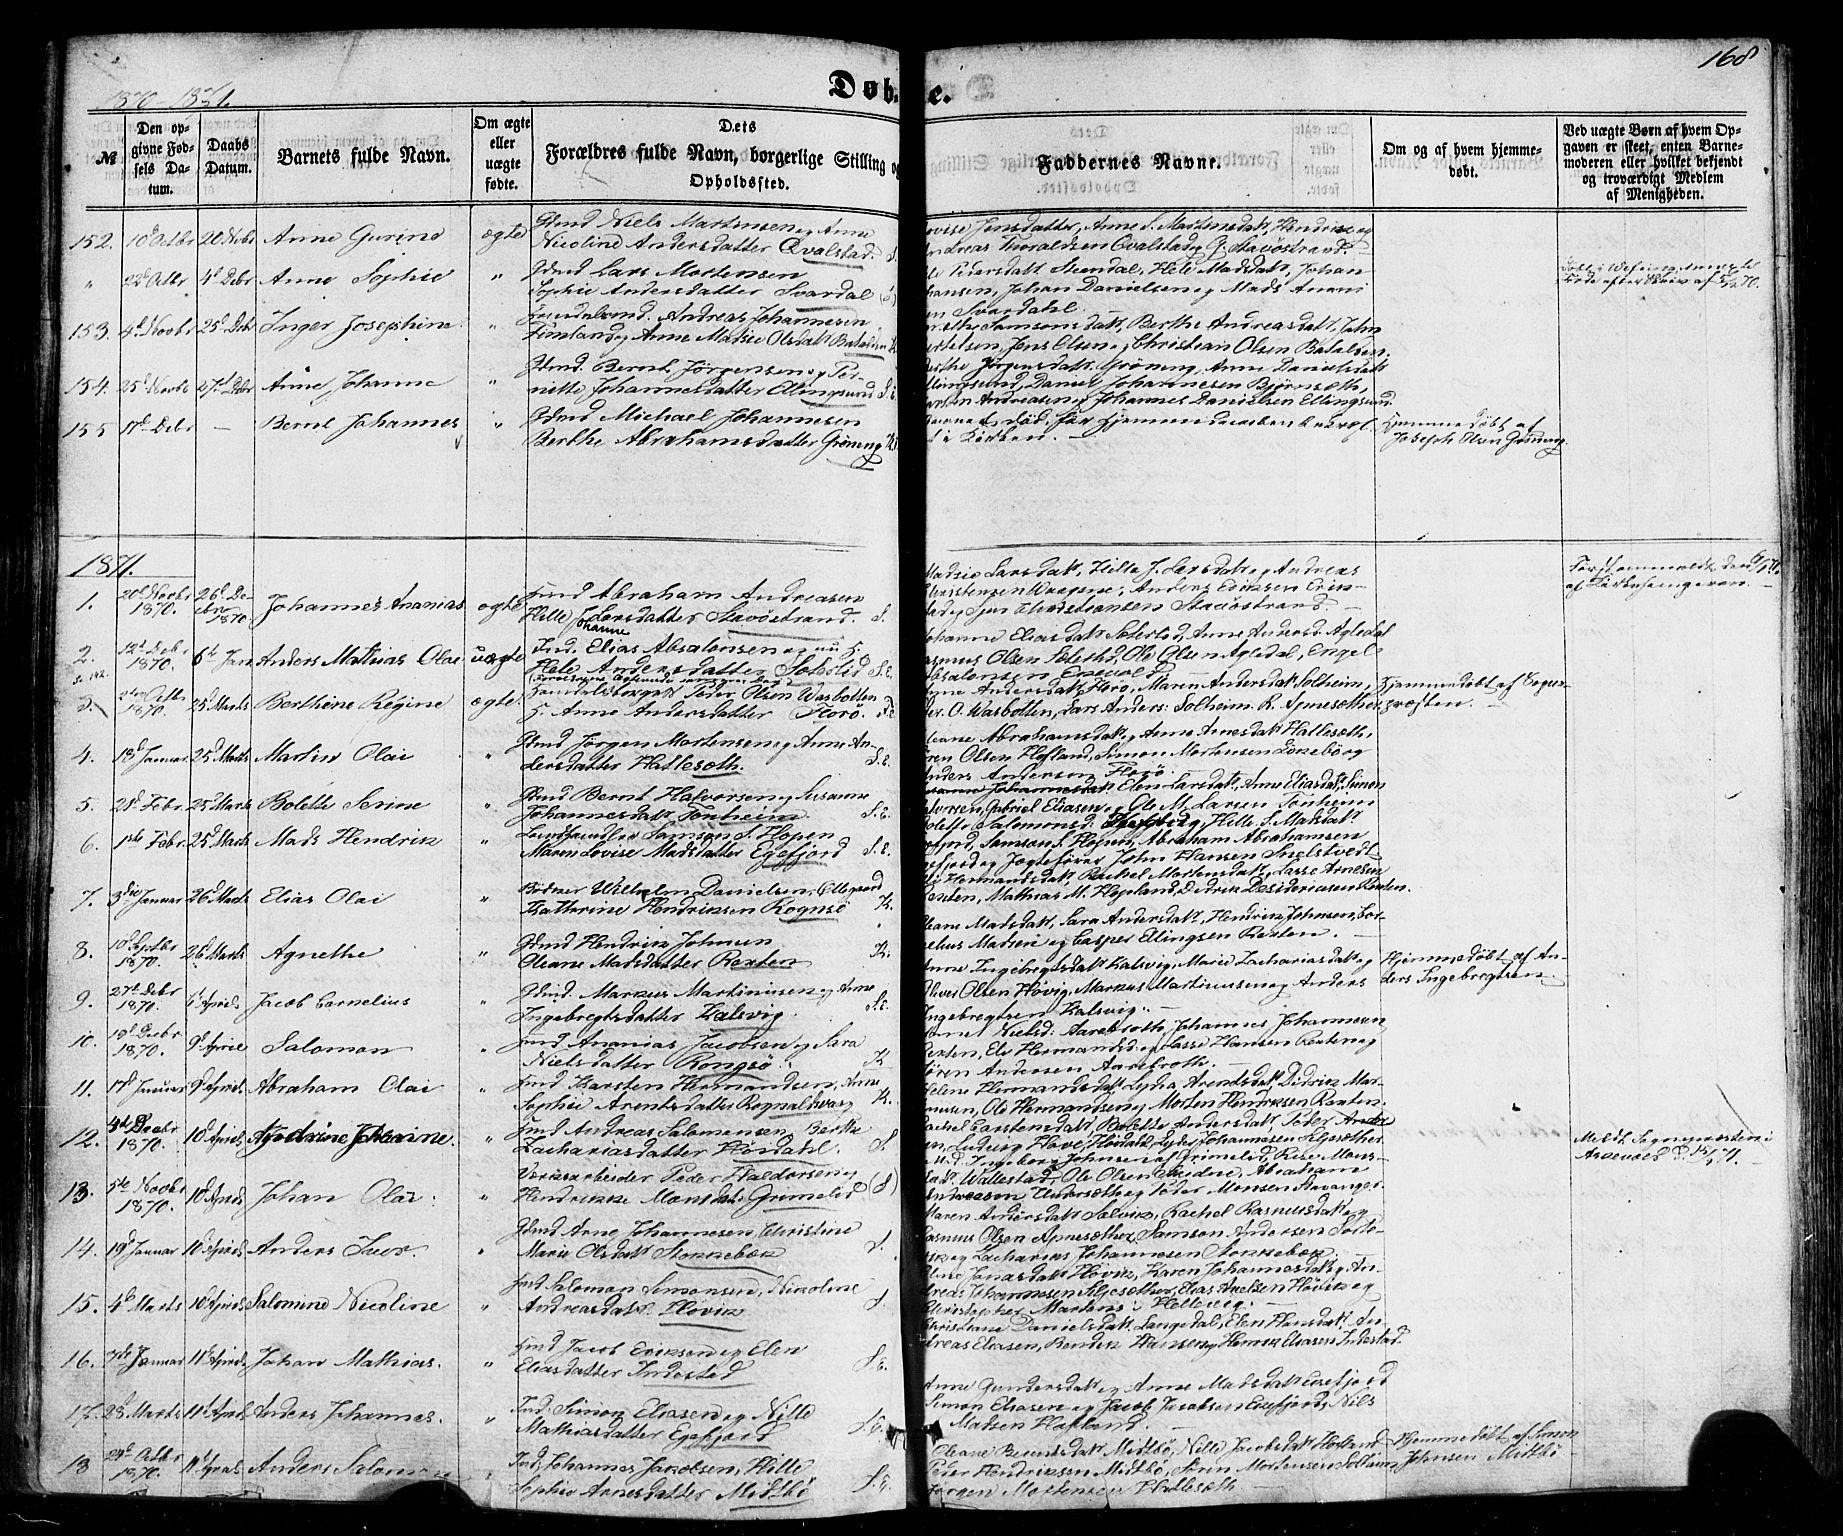 SAB, Kinn sokneprestembete, H/Haa/Haaa/L0006: Ministerialbok nr. A 6, 1857-1885, s. 168